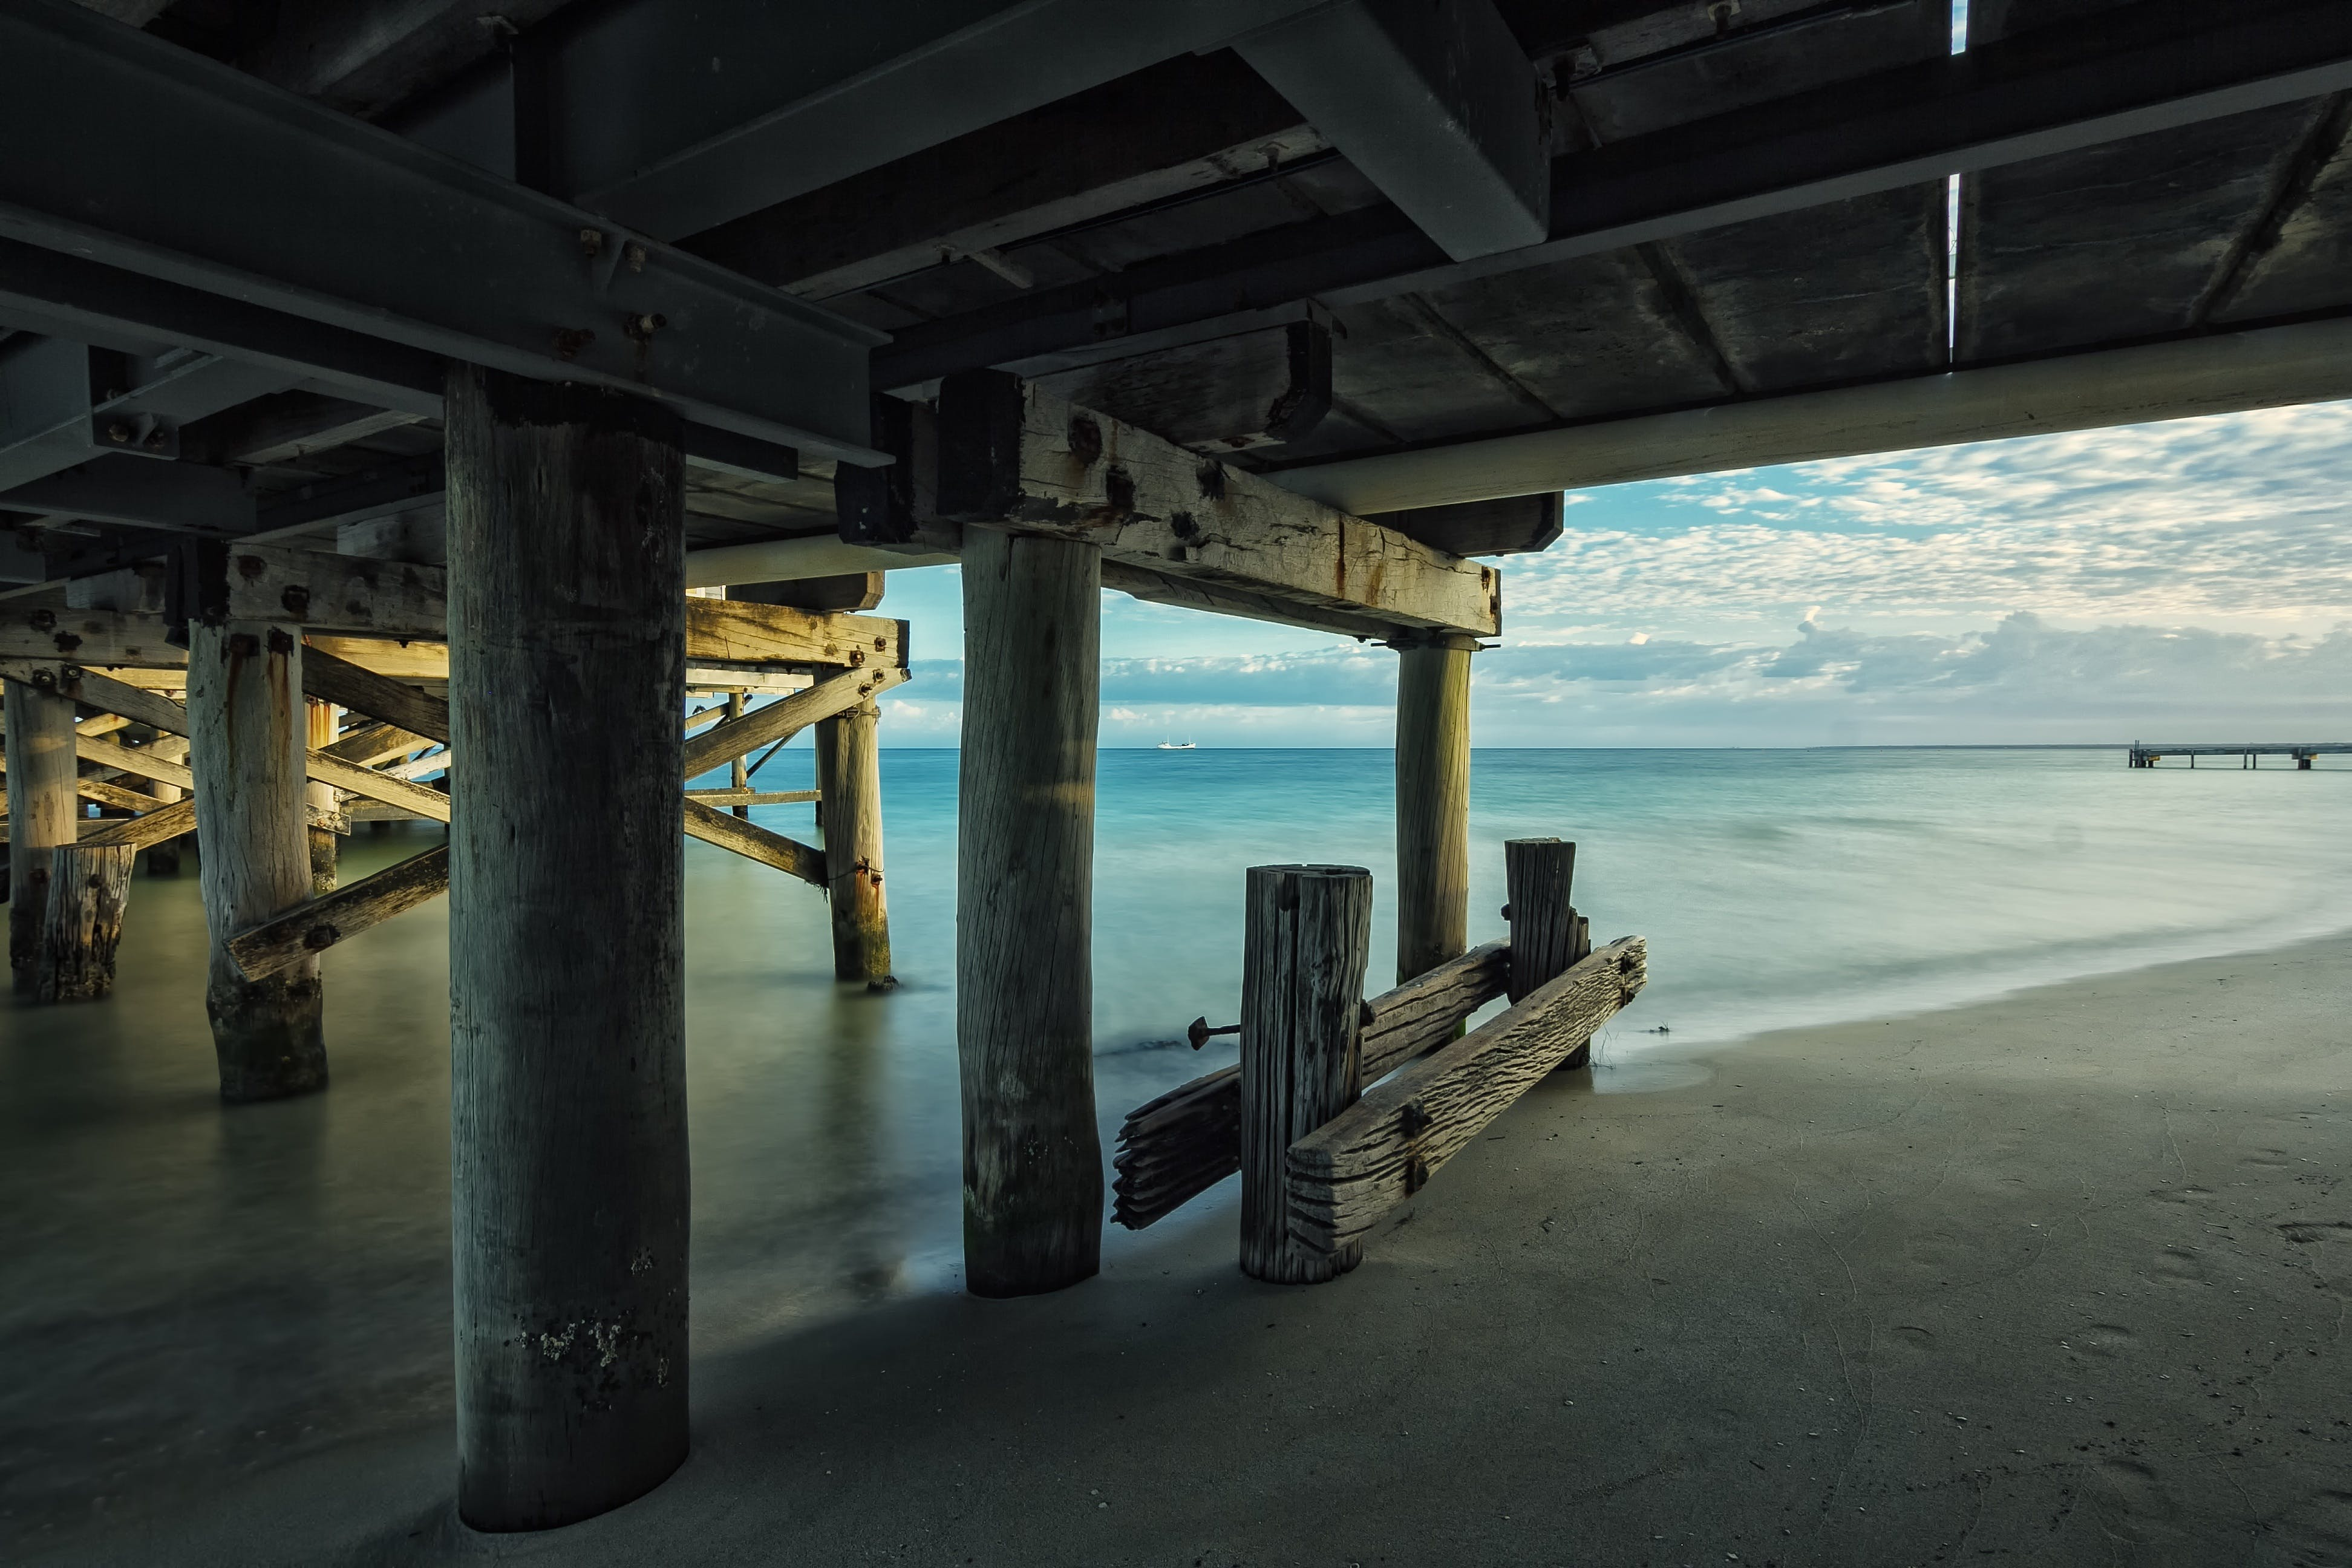 Gray Sand Beside Seashore Under Clear Blue Sky